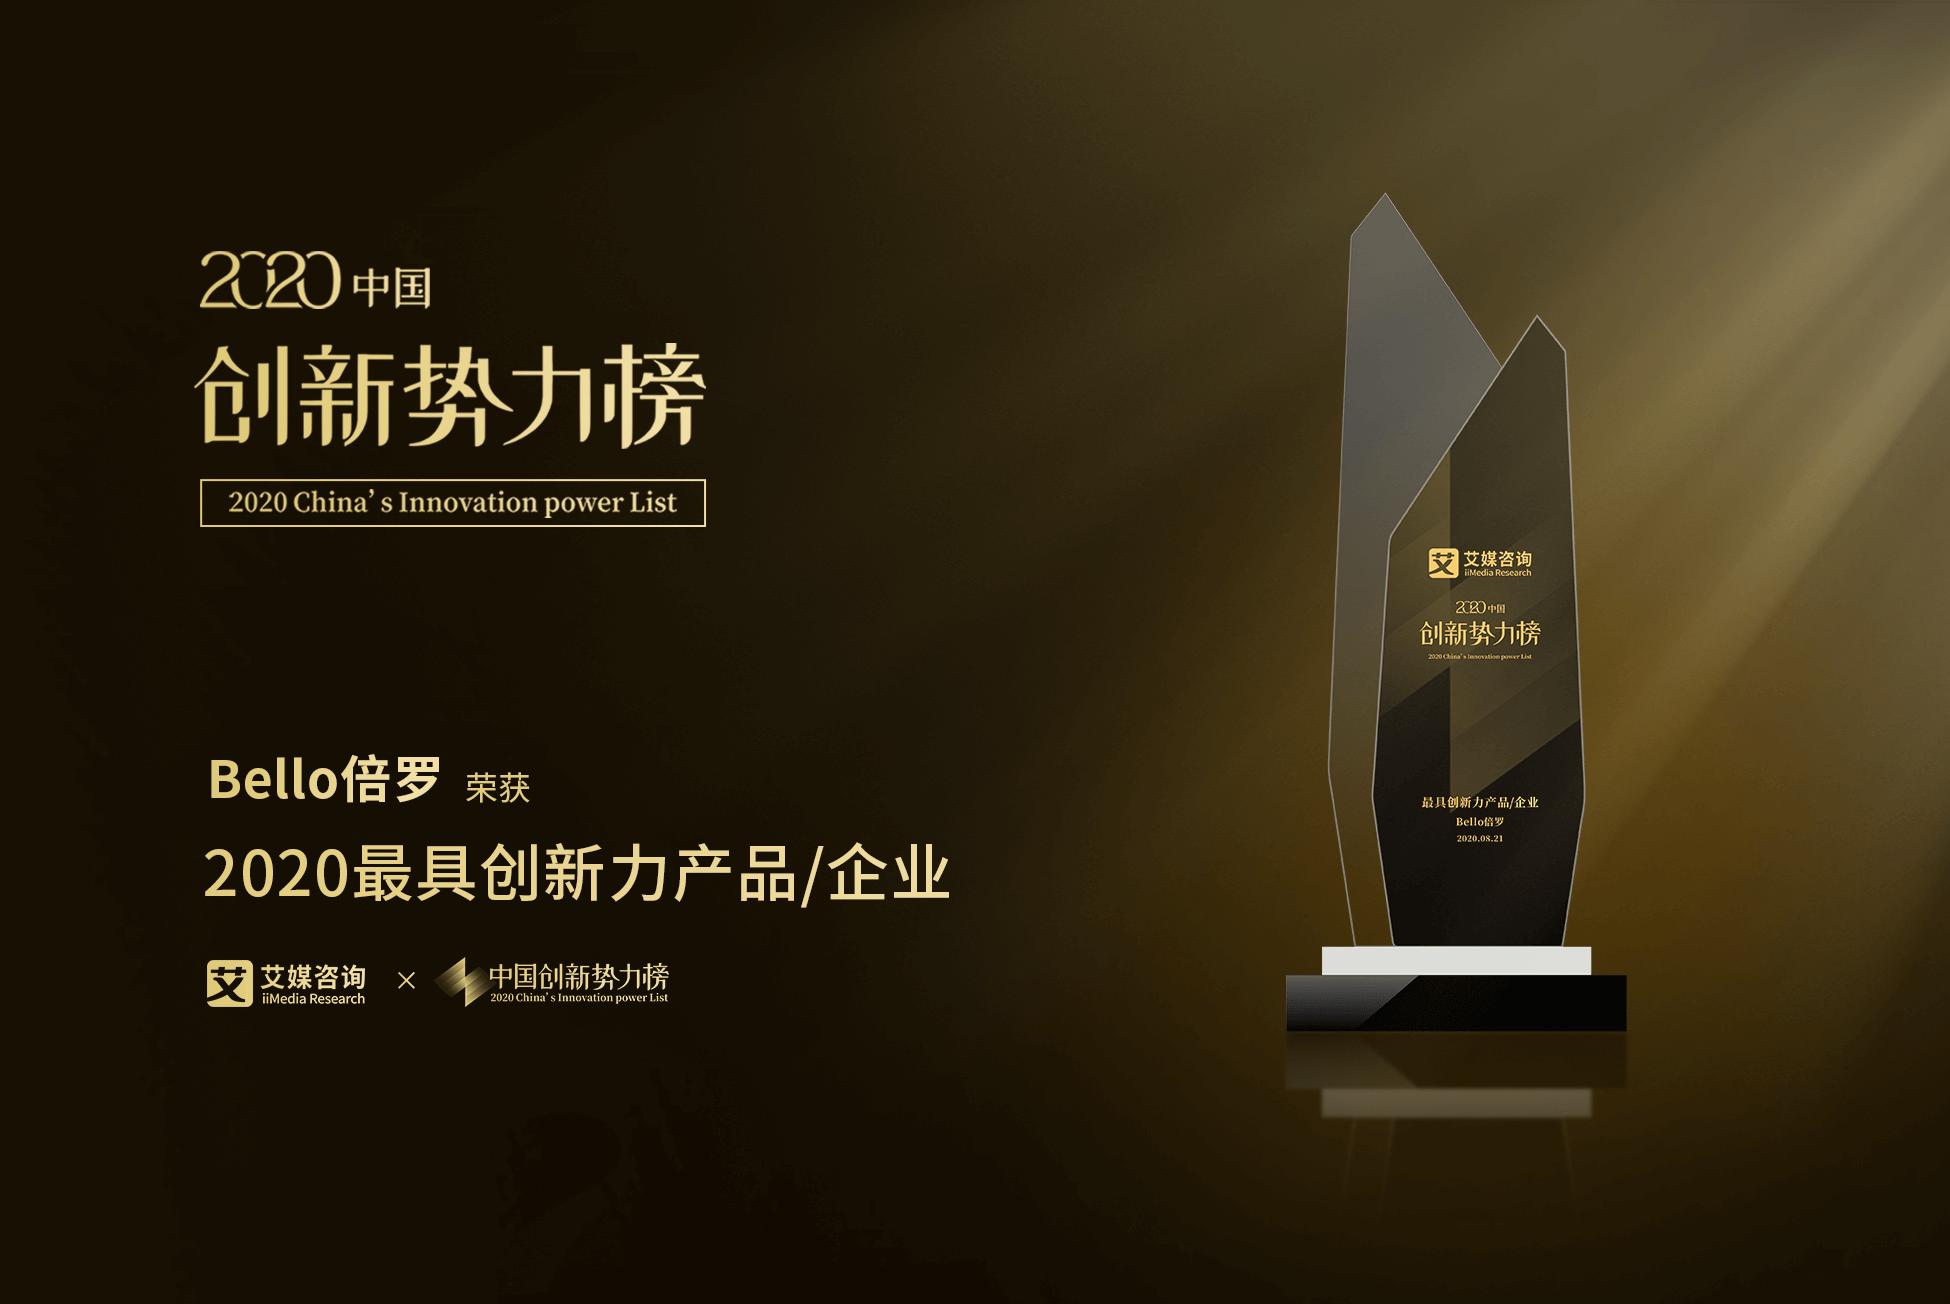 "Bello倍罗荣获2020中国创新势力榜""最具创新力产品/企业""大奖"